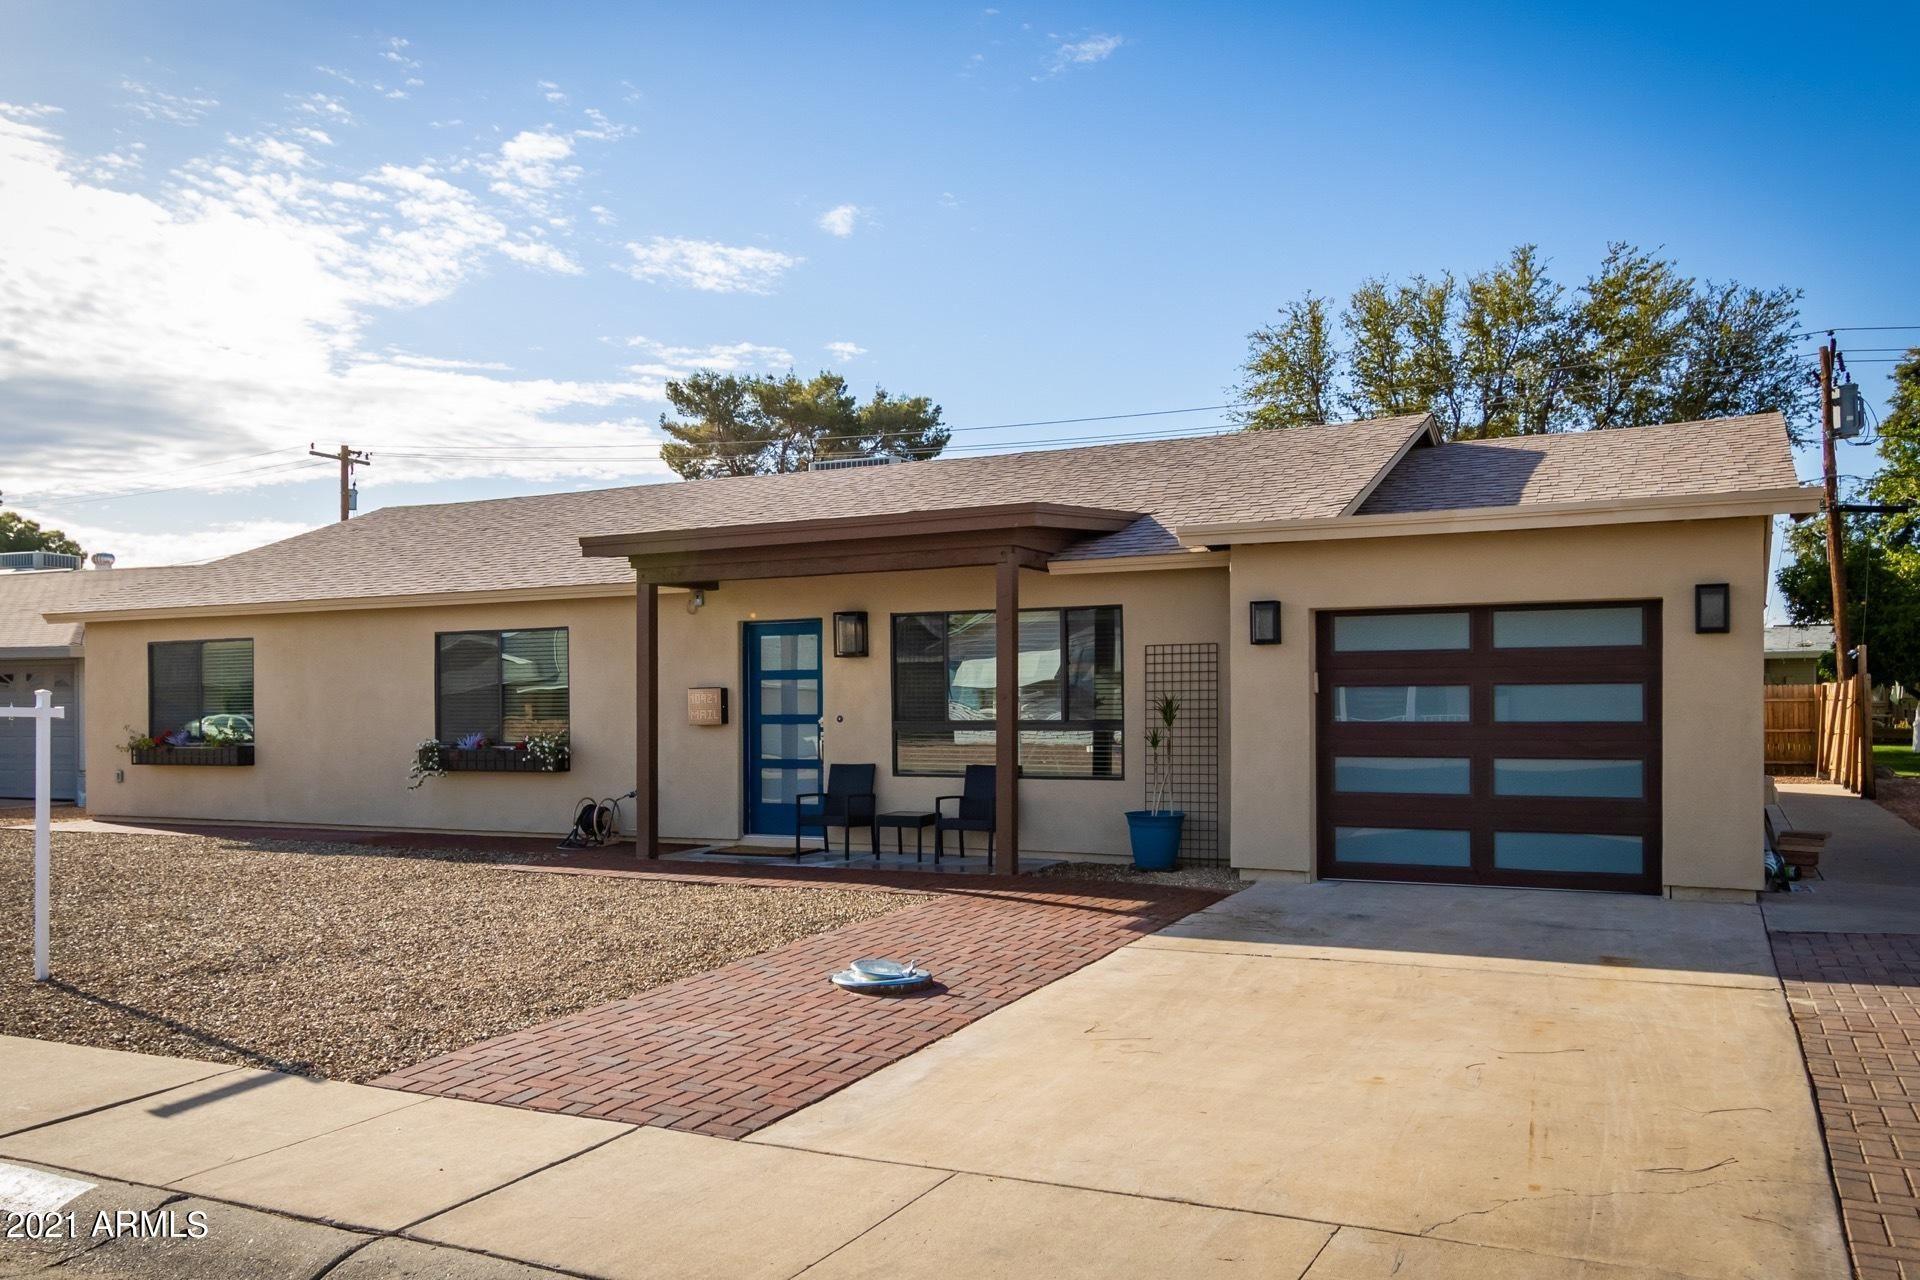 Photo of 10921 W GREER Avenue, Sun City, AZ 85351 (MLS # 6201323)